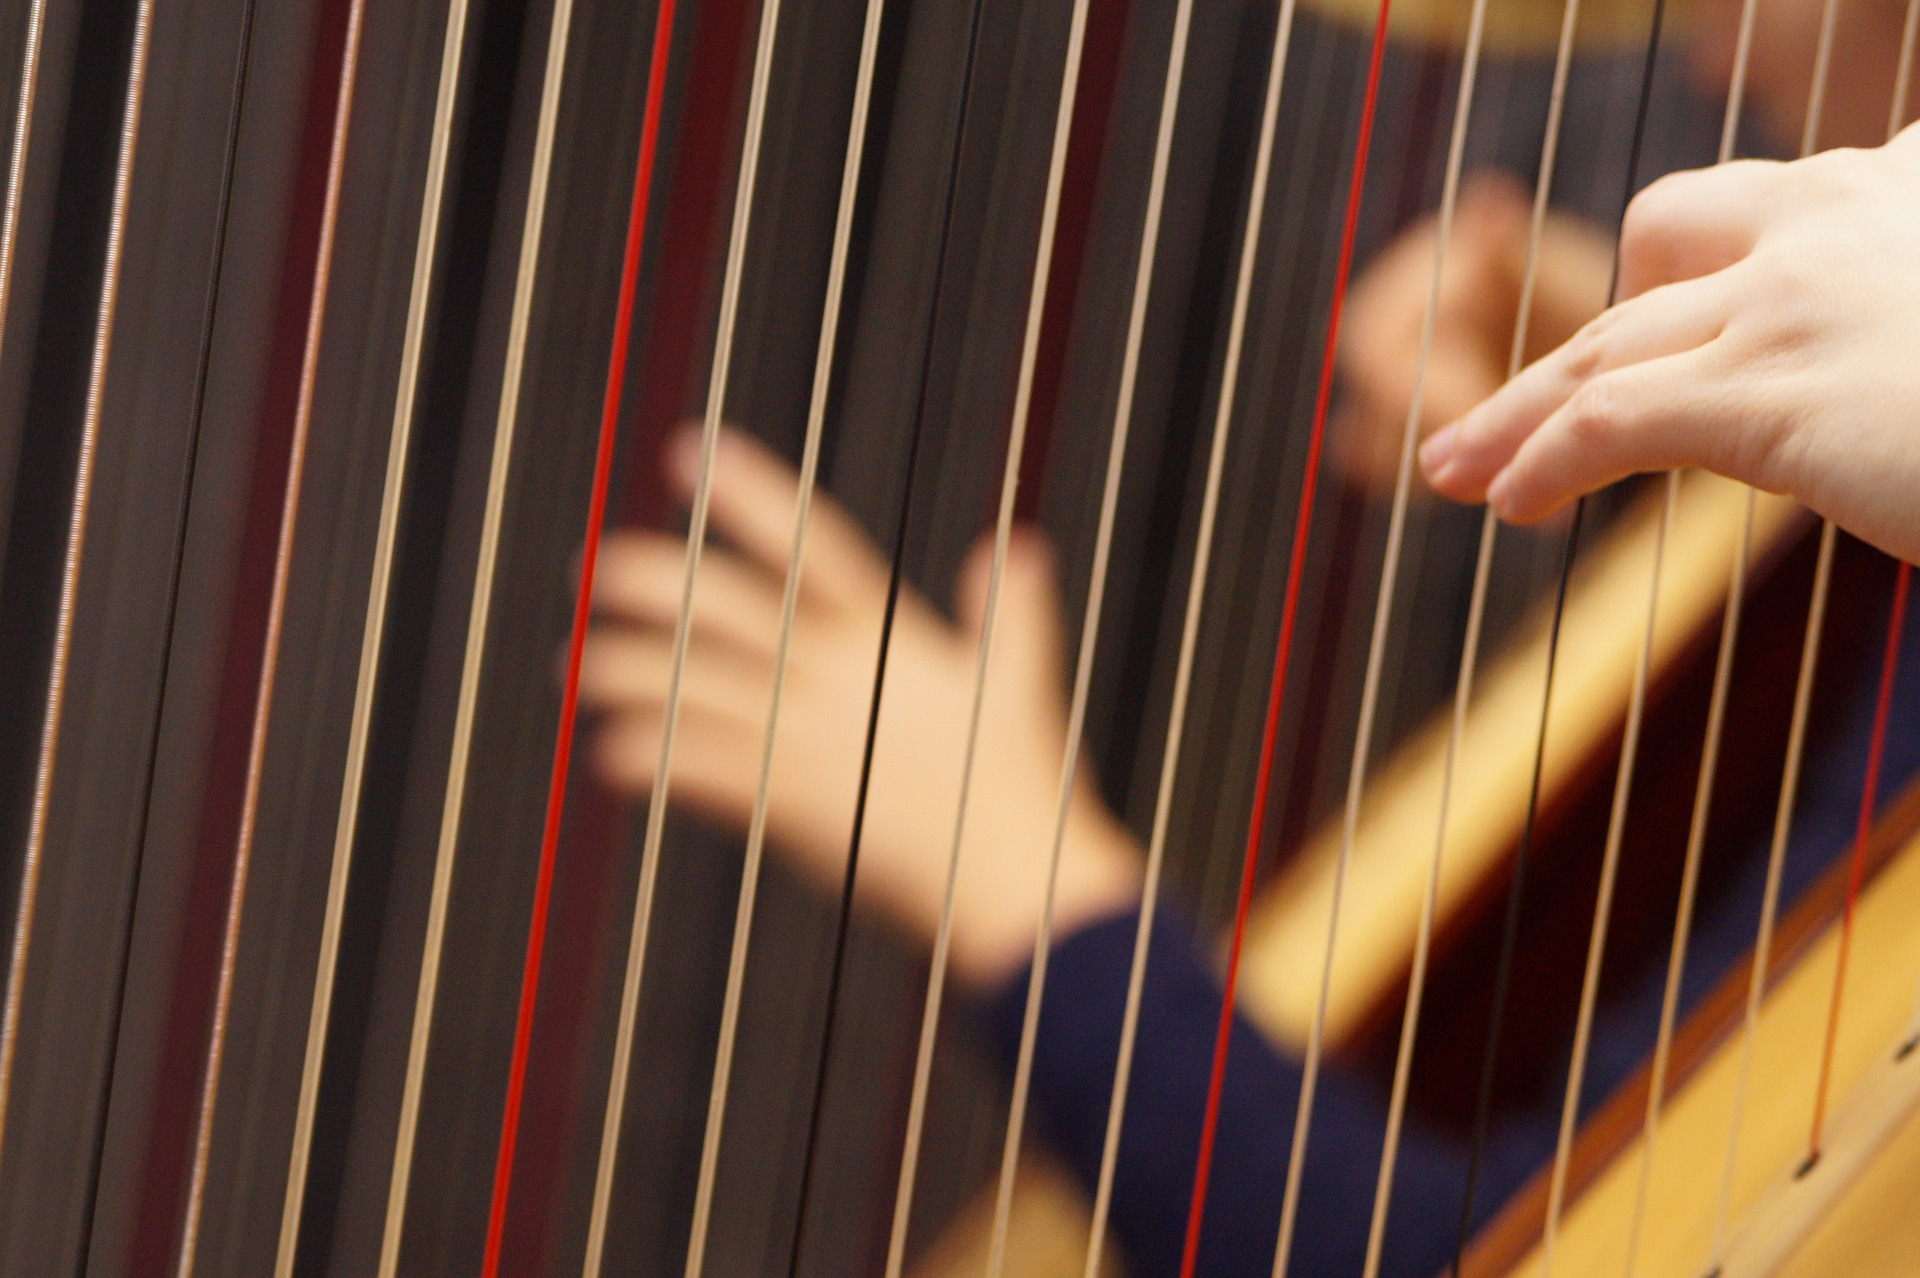 musical-instrument-1566606_1920.jpg